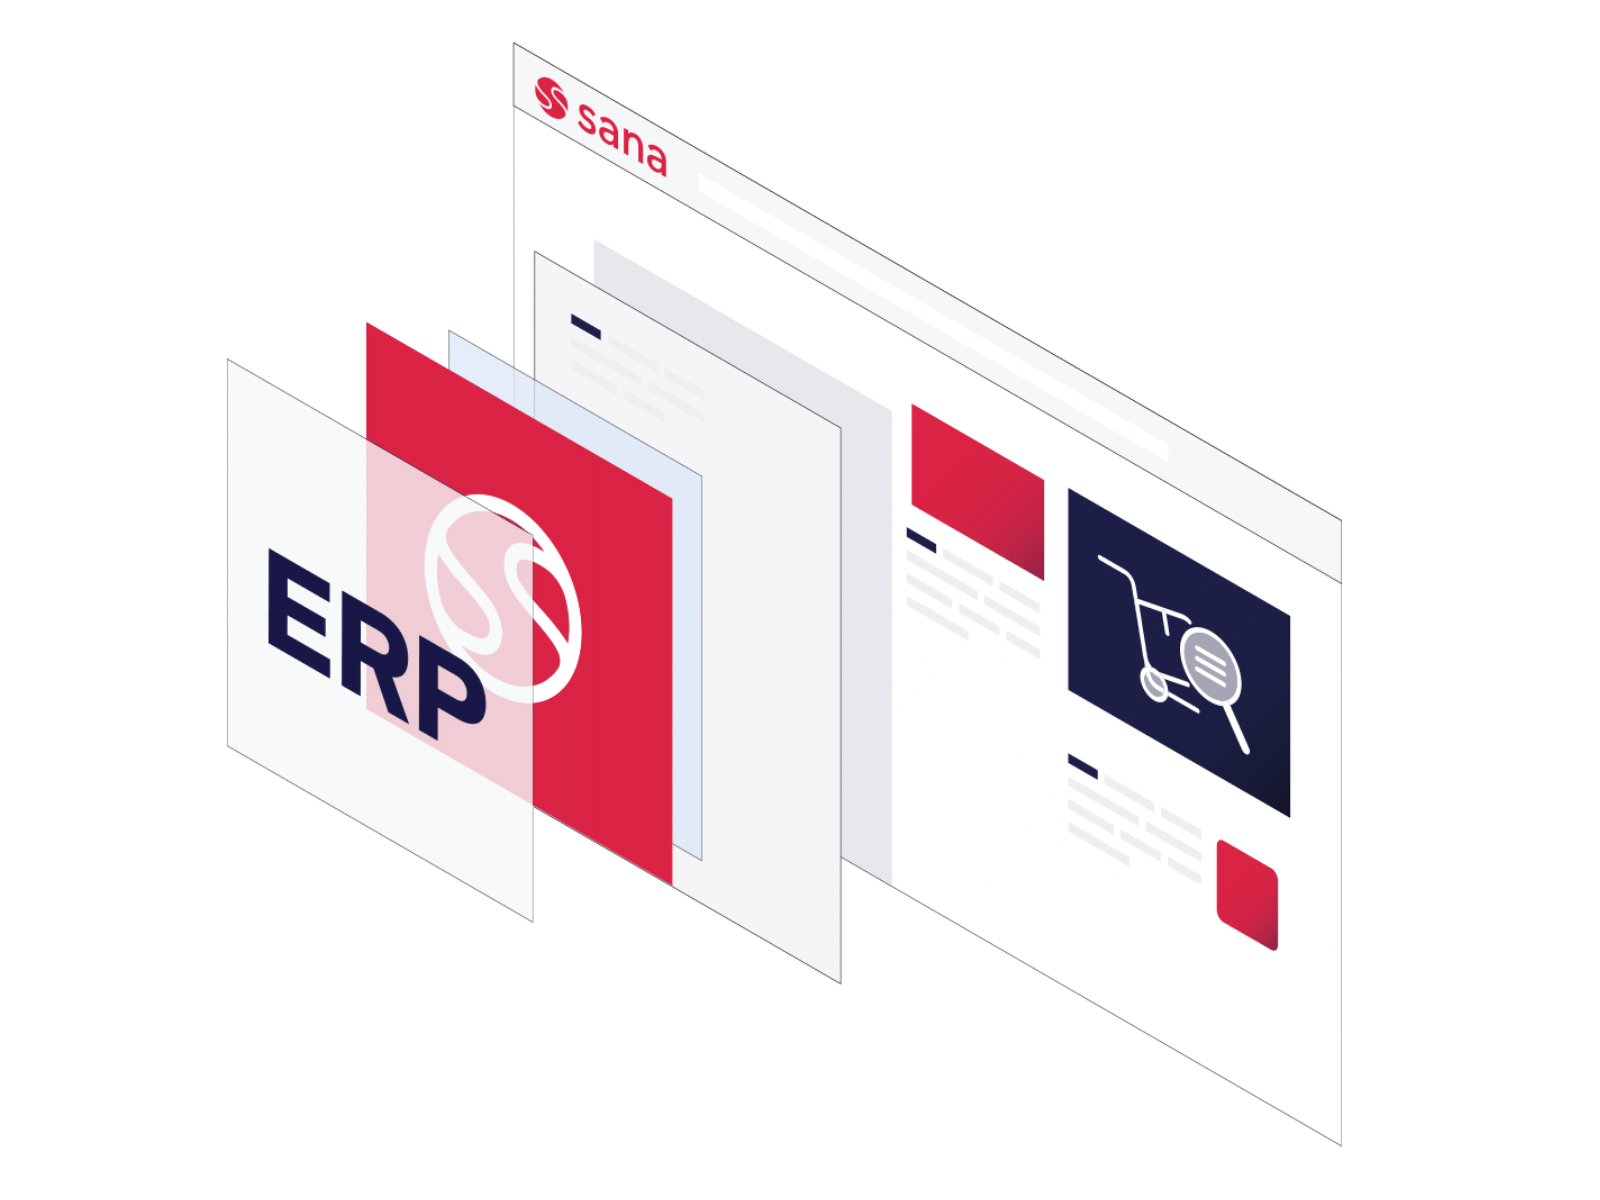 Header image displaying ERP integration for enterprise solutions - Sana Commerce